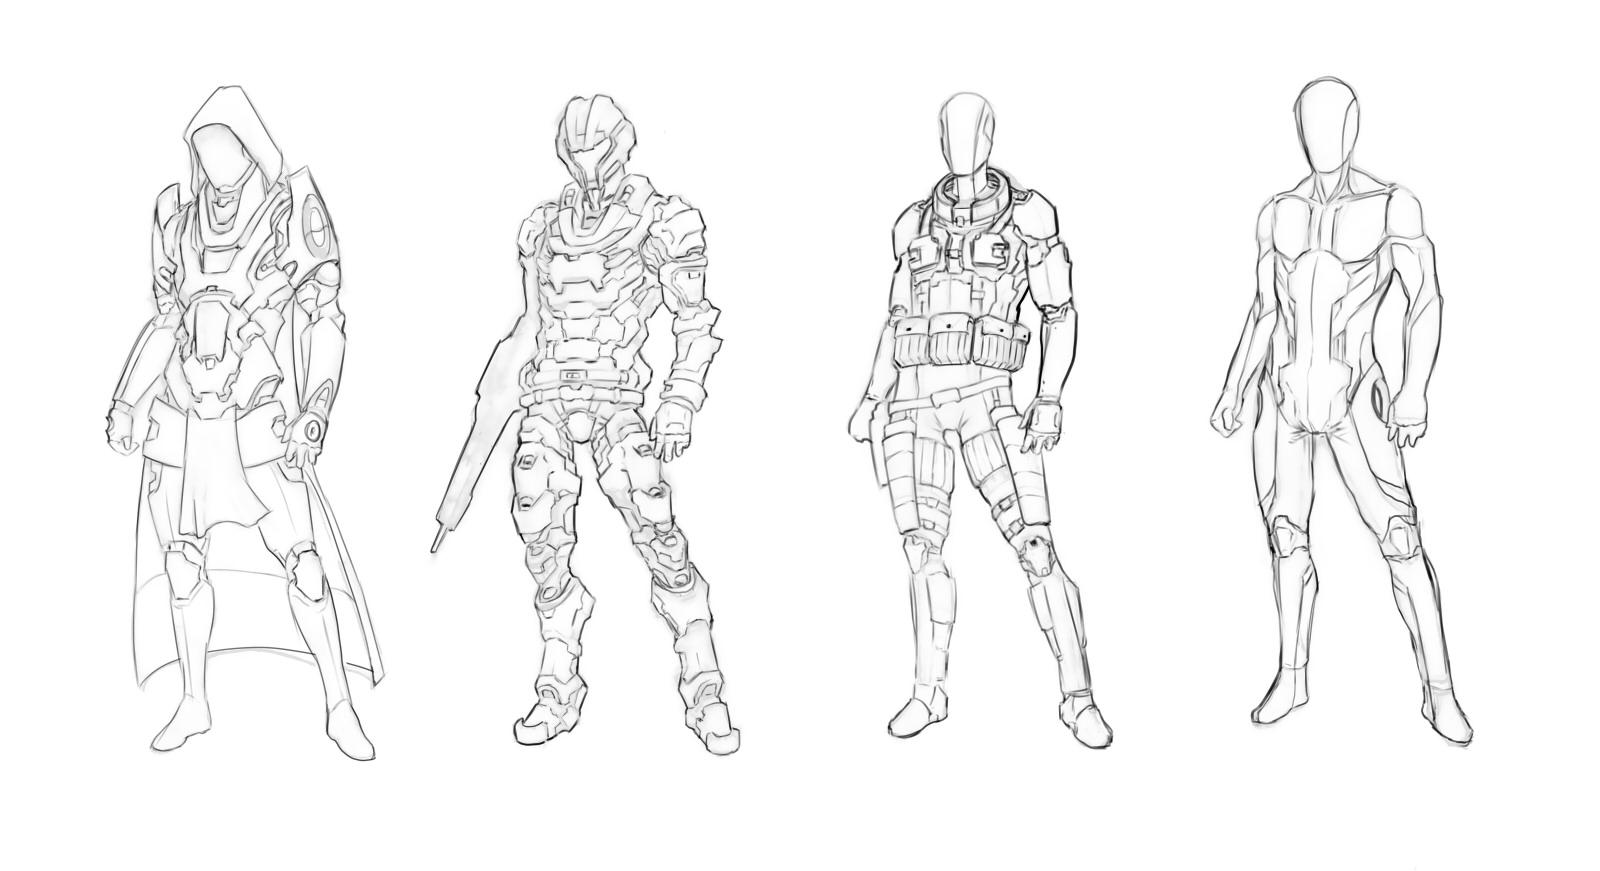 Chris De Paoli's Art Blog: Sci-fi soldiers